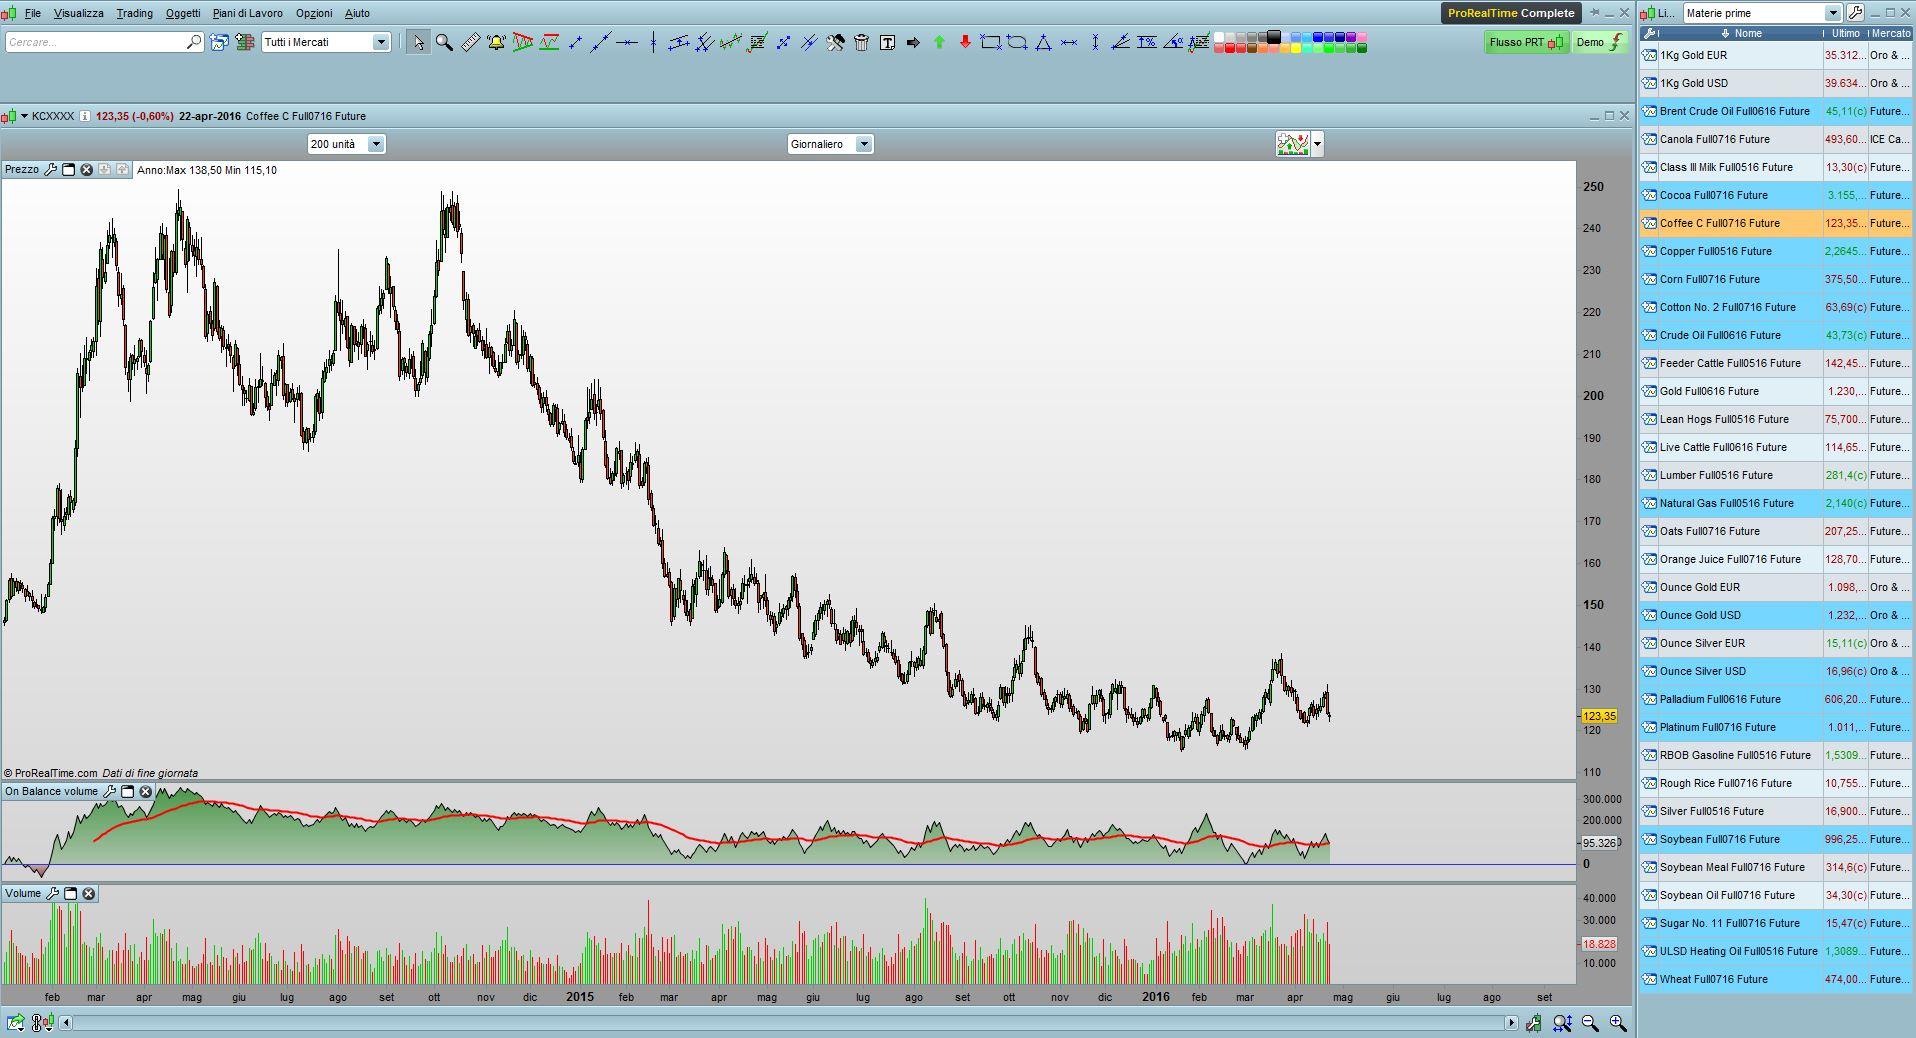 grafici trading online gratis